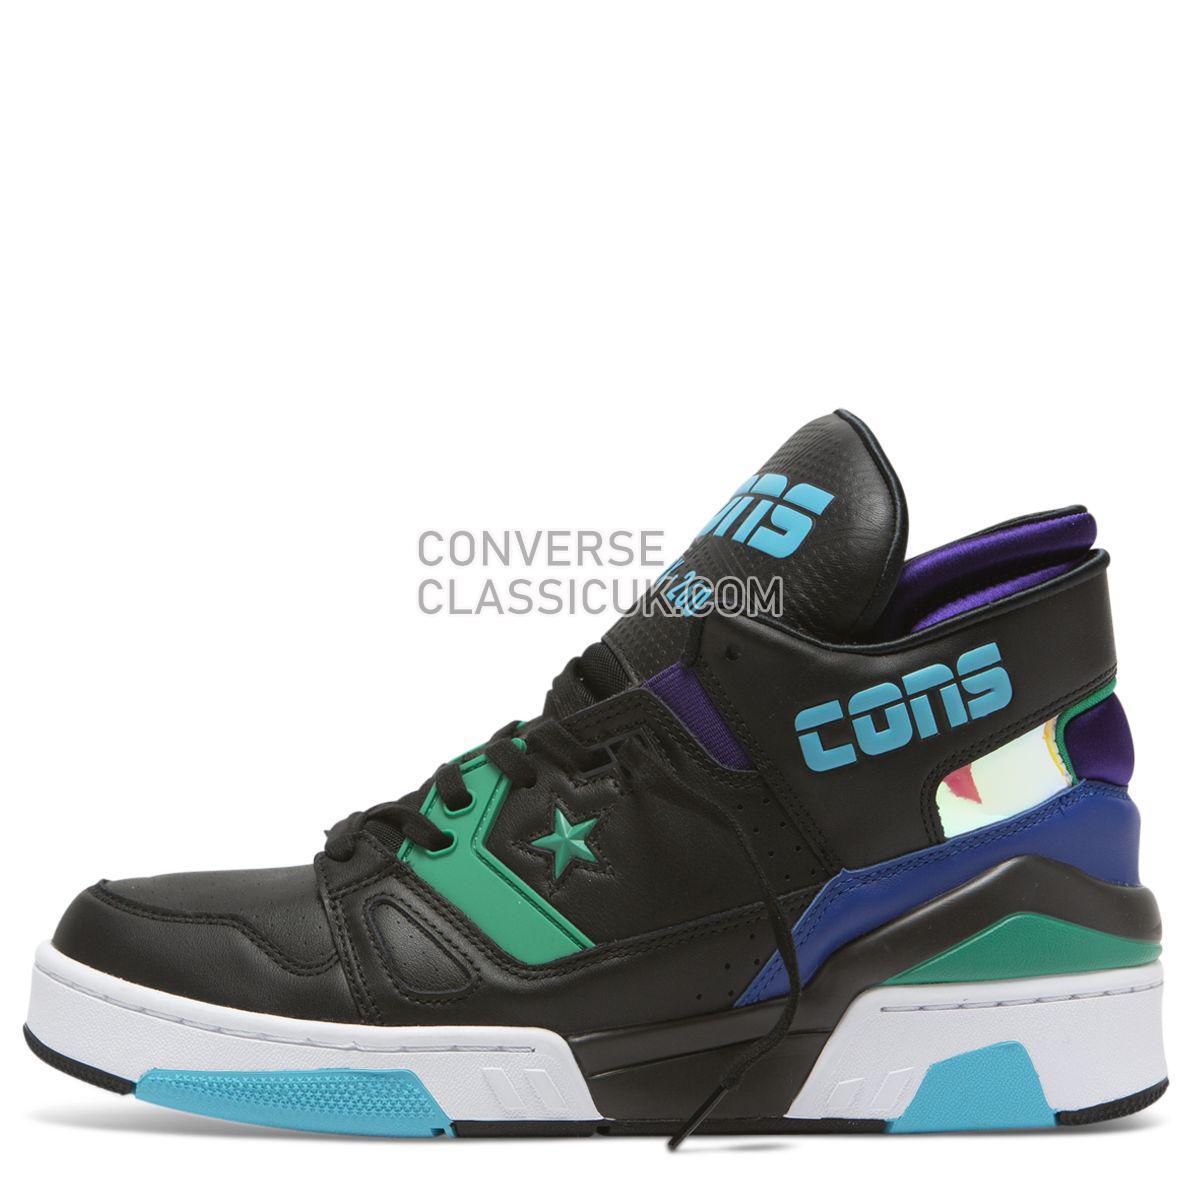 Converse X Don C ERX 260 Jewel Mid Black/Court Purple Mens 164386 Black/Court Purple/Bold Jade Shoes